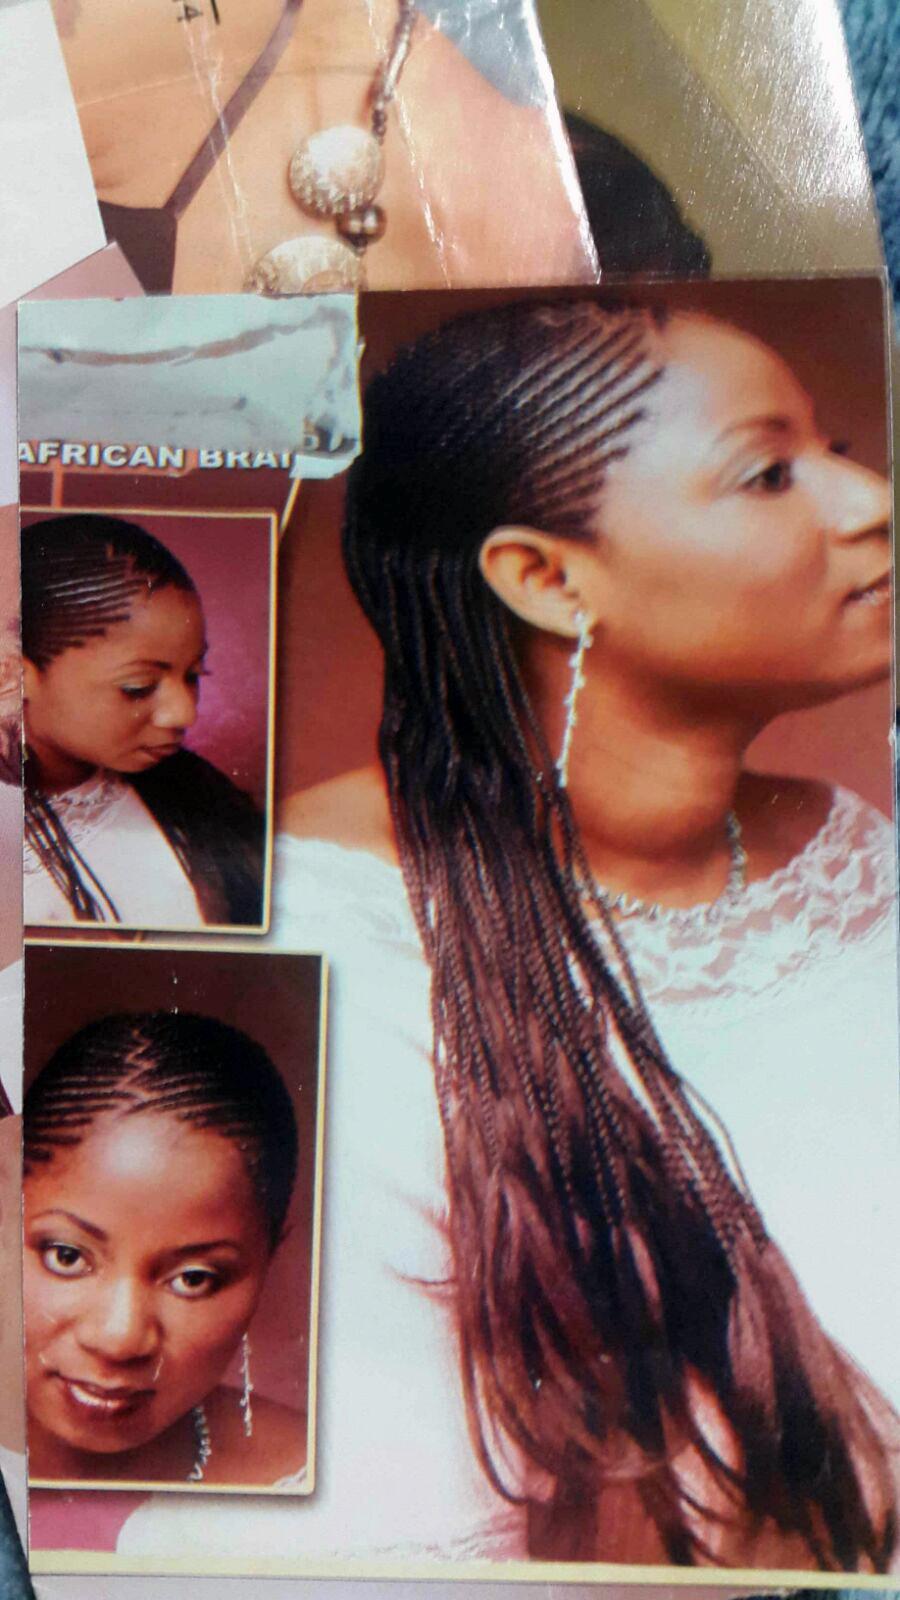 Hair Salon Hair Stylists Salon Services Chicago Il